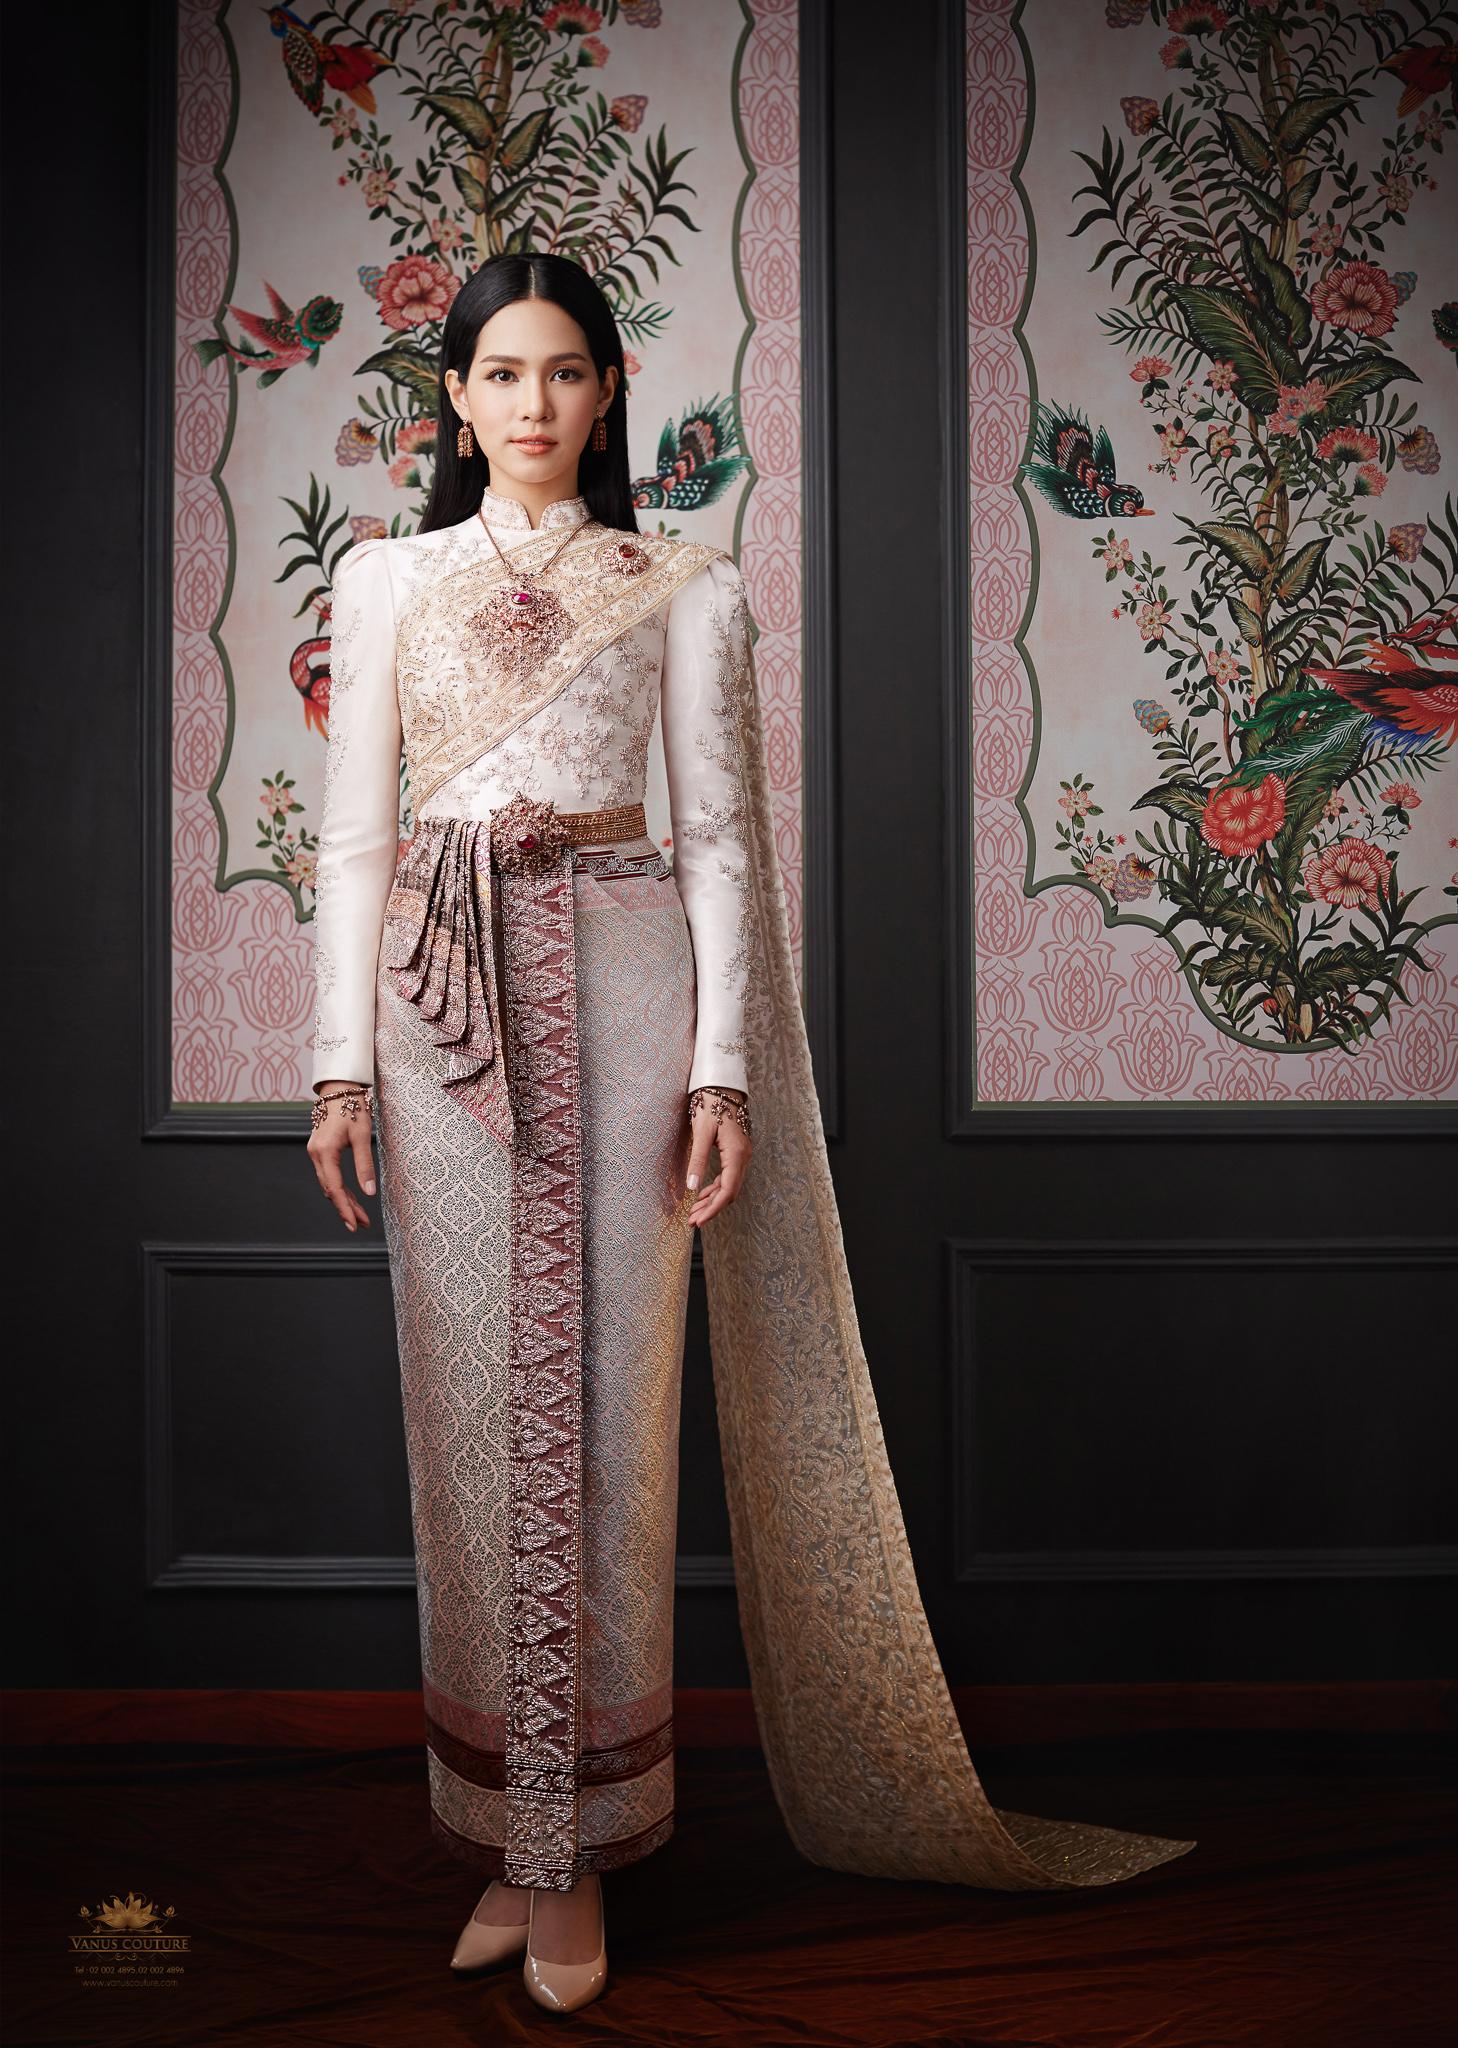 Thai traditional dress - Bint 04